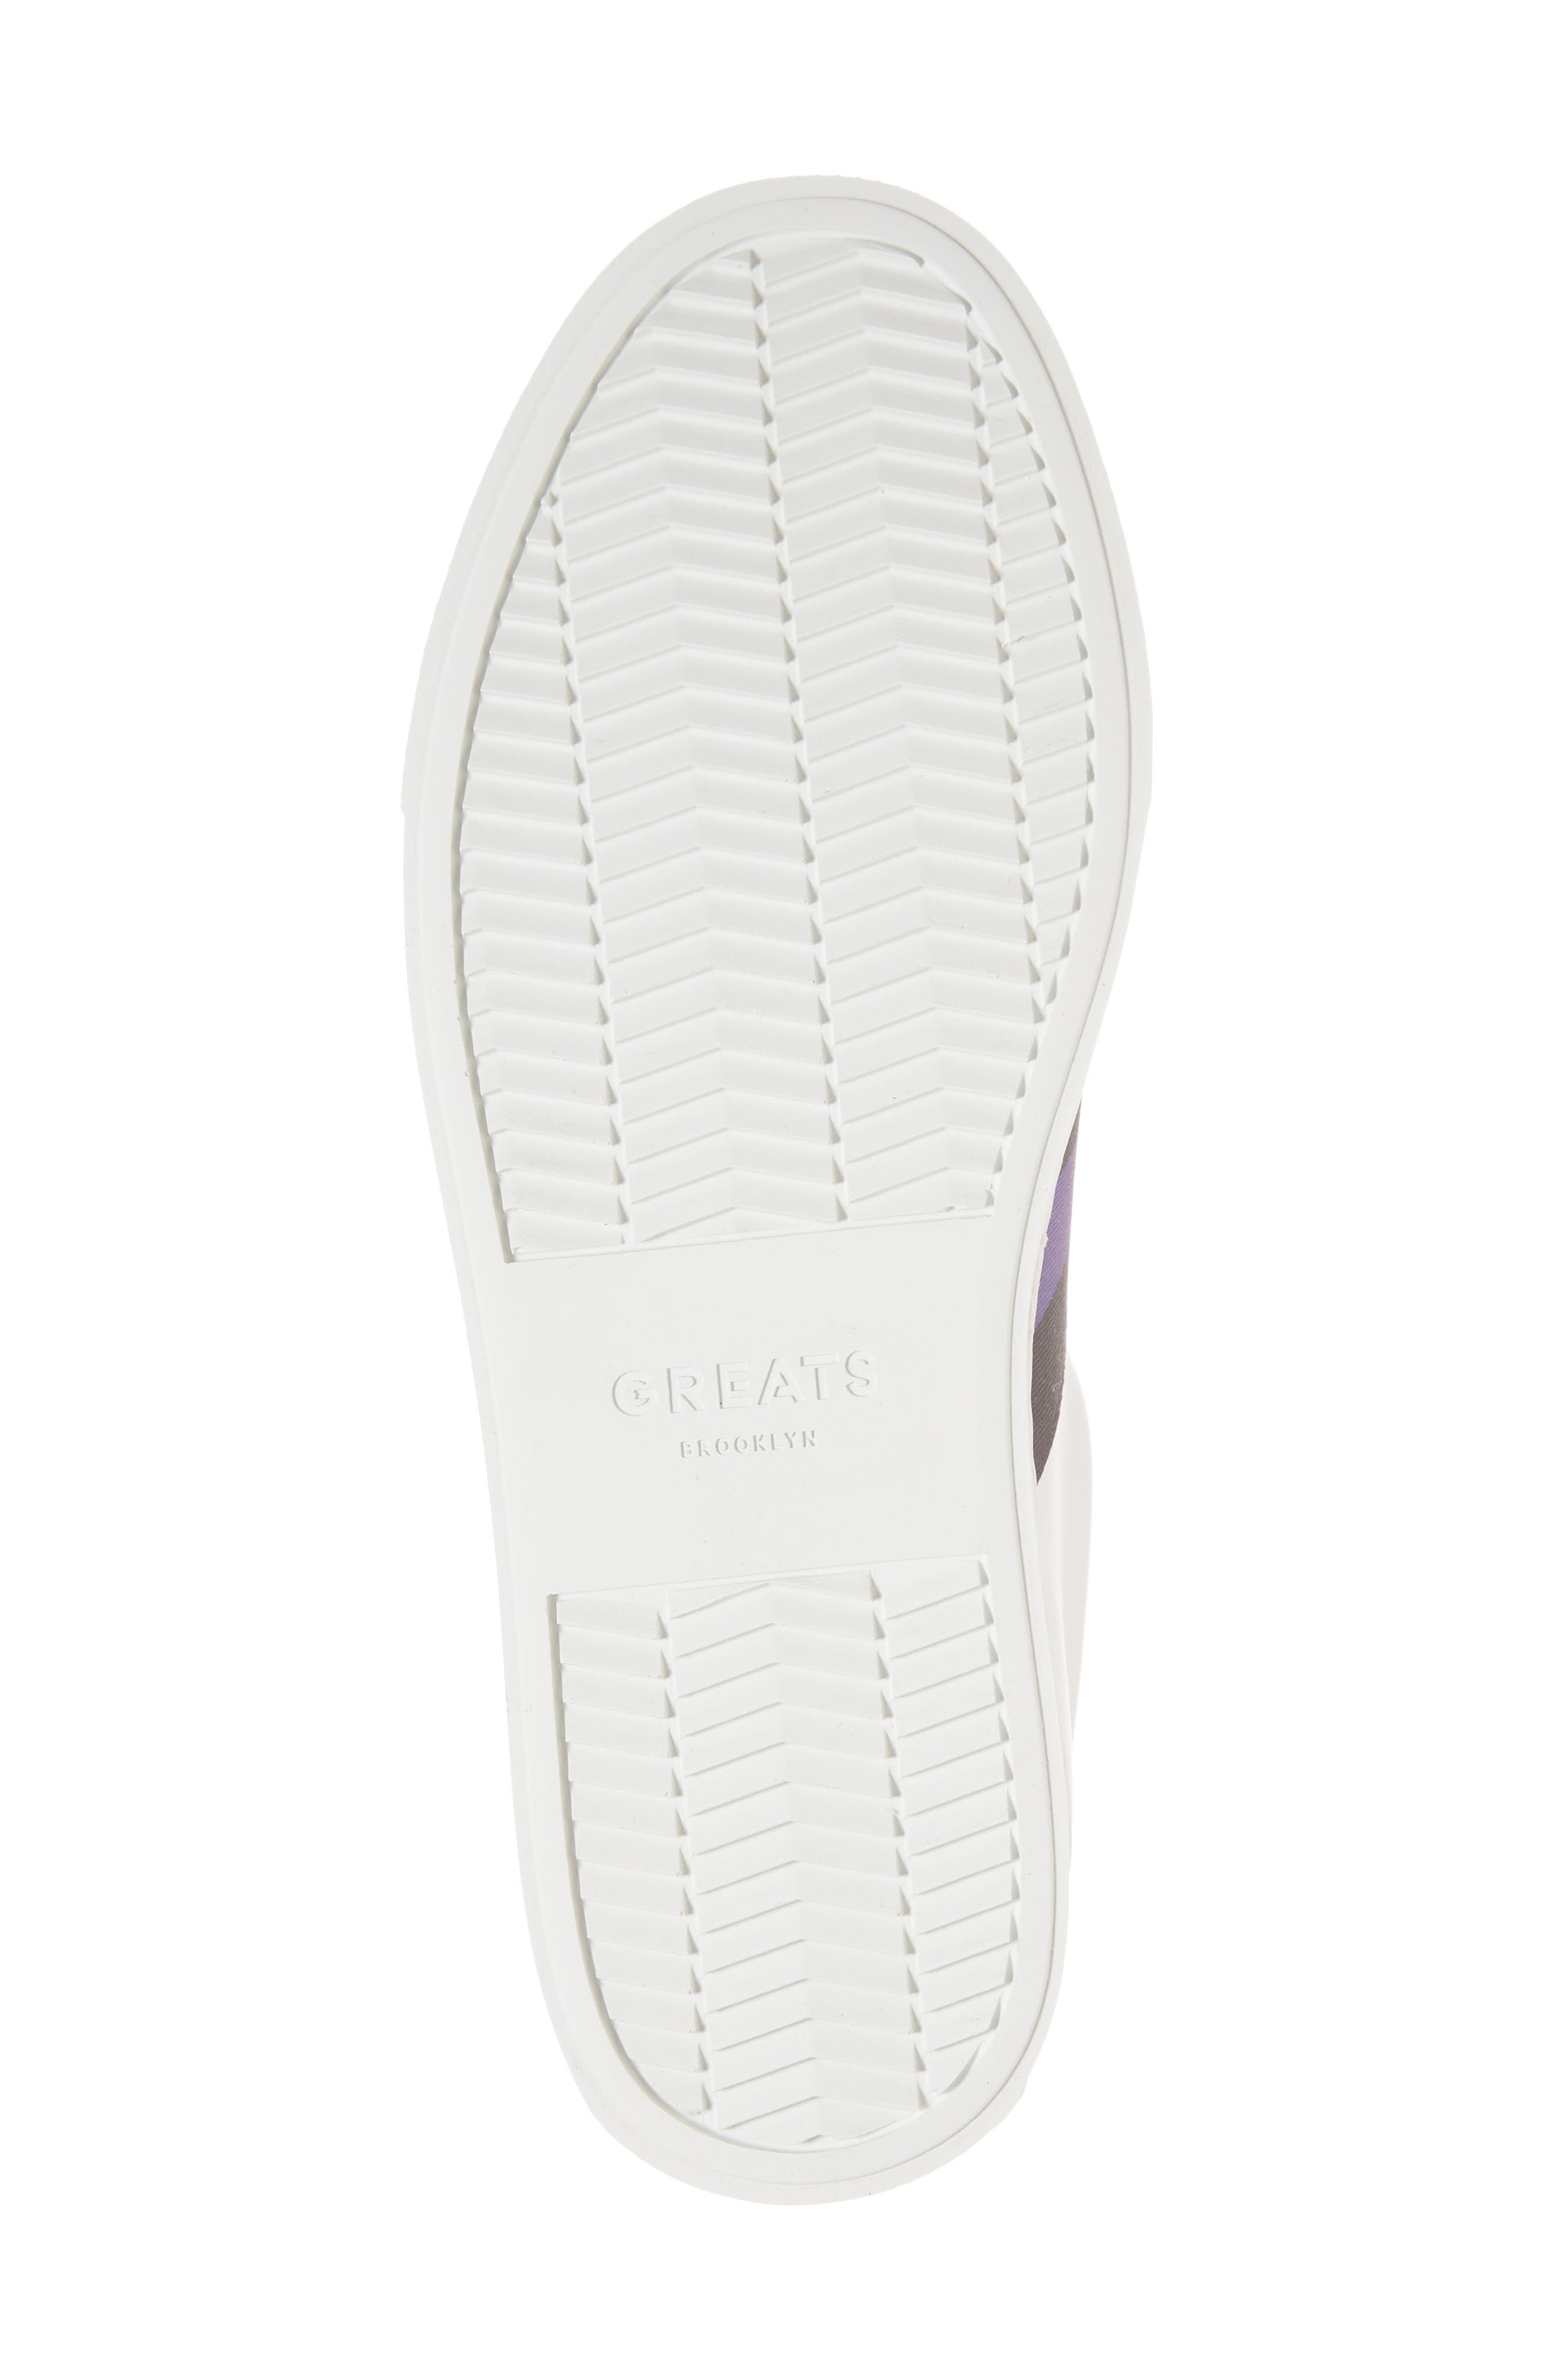 Royale Stripe Sneaker,                             Alternate thumbnail 6, color,                             WHITE/ BLACK/ VIOLET